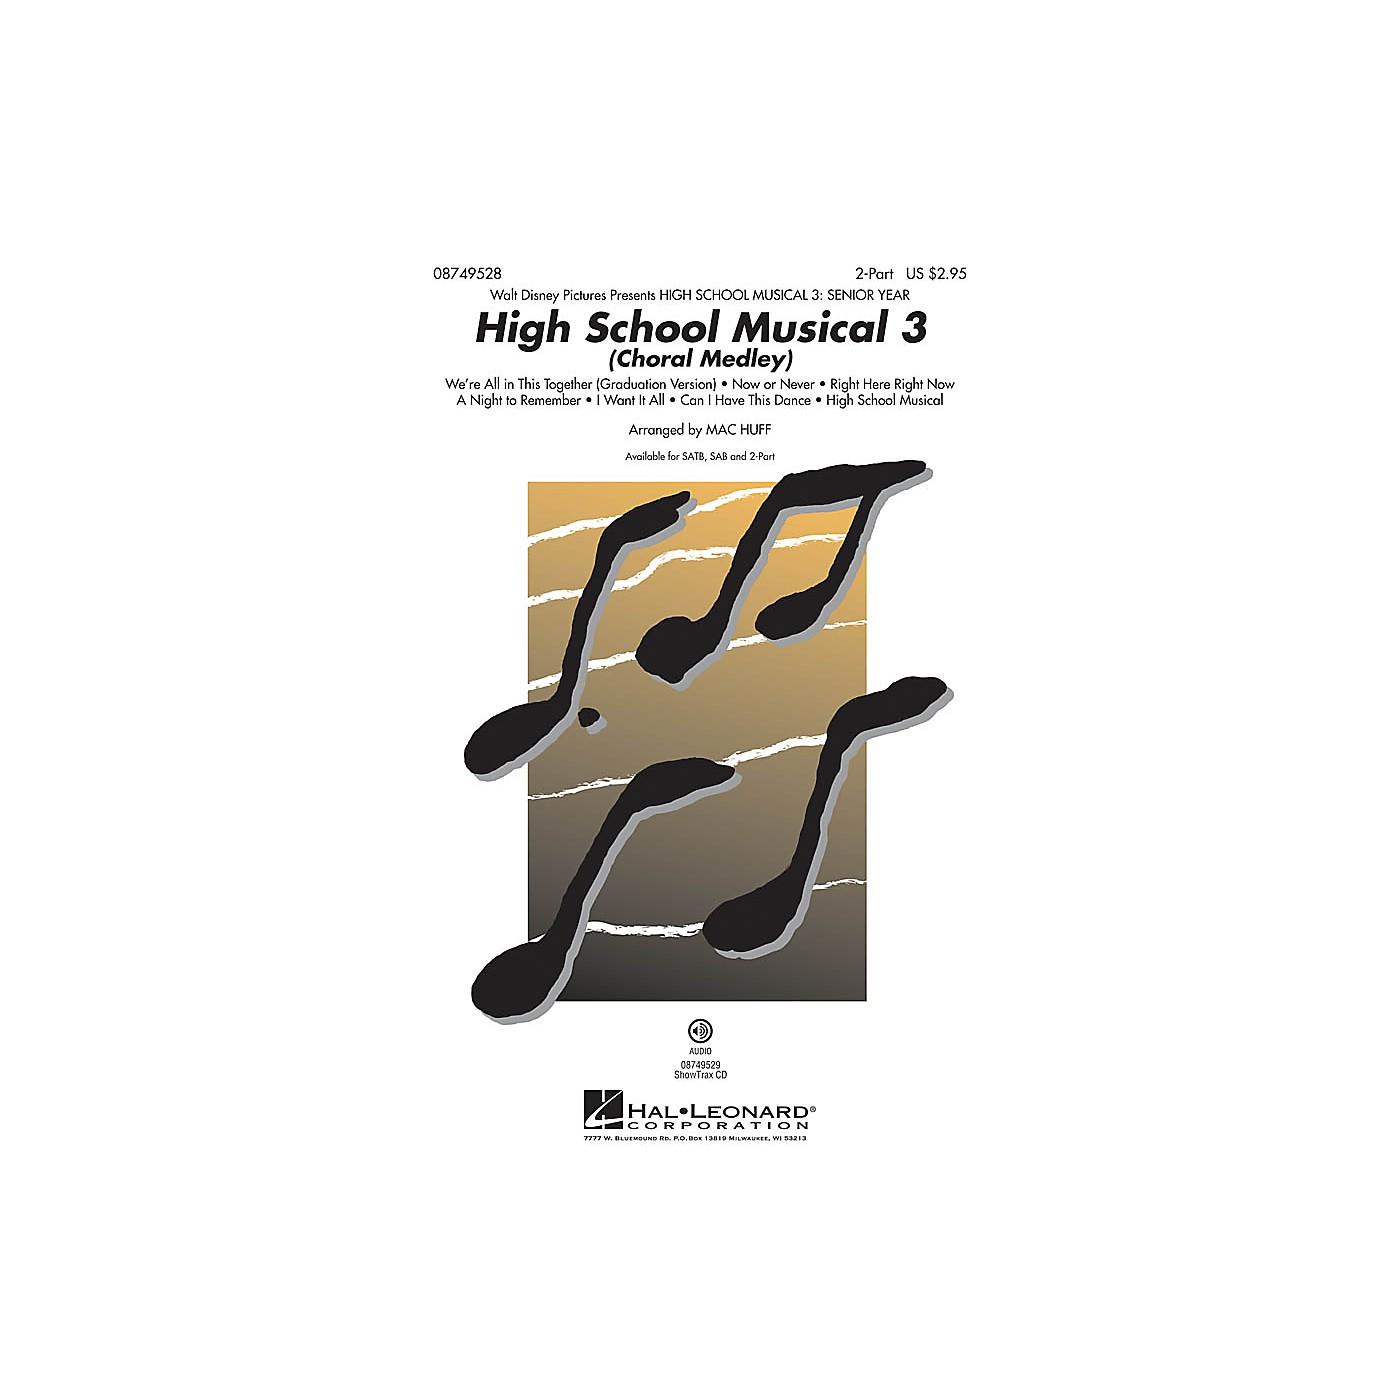 Hal Leonard High School Musical 3 (Choral Medley) 2-Part arranged by Mac Huff thumbnail